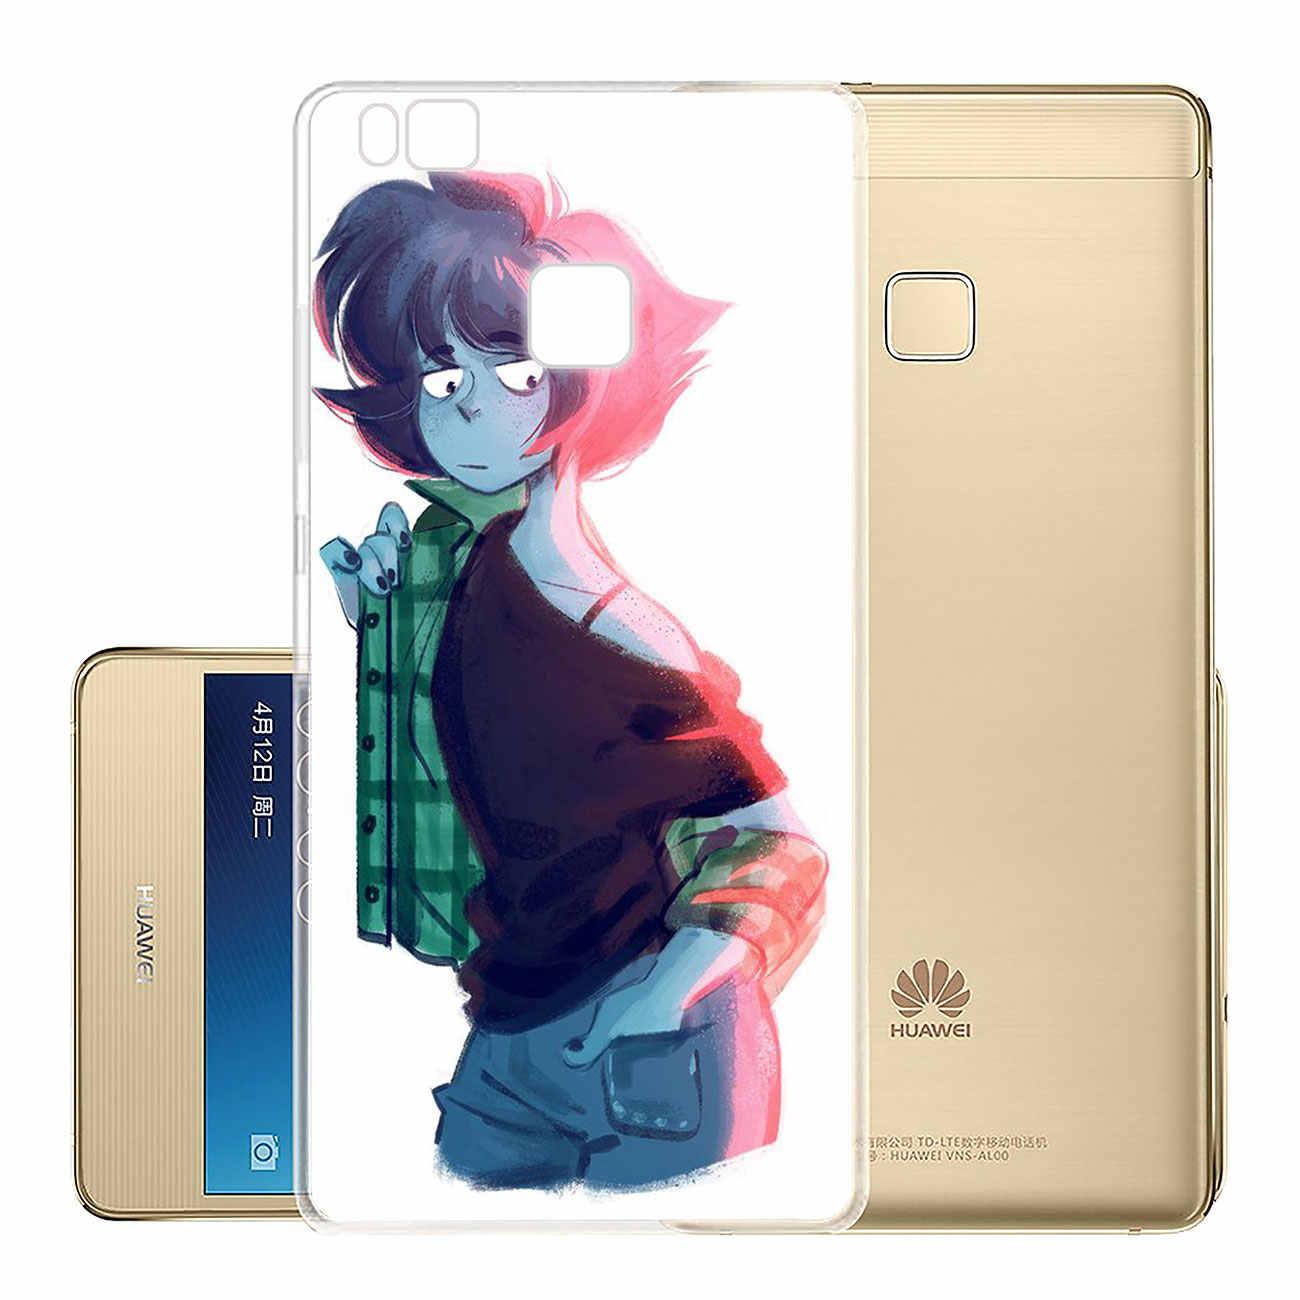 Lavaza Cartoon Steven Universe Telefon Fall für Huawei P30 P20 Pro P9 P10 Plus P8 Lite Mini 2016 2017 P smart Z 2019 Abdeckung